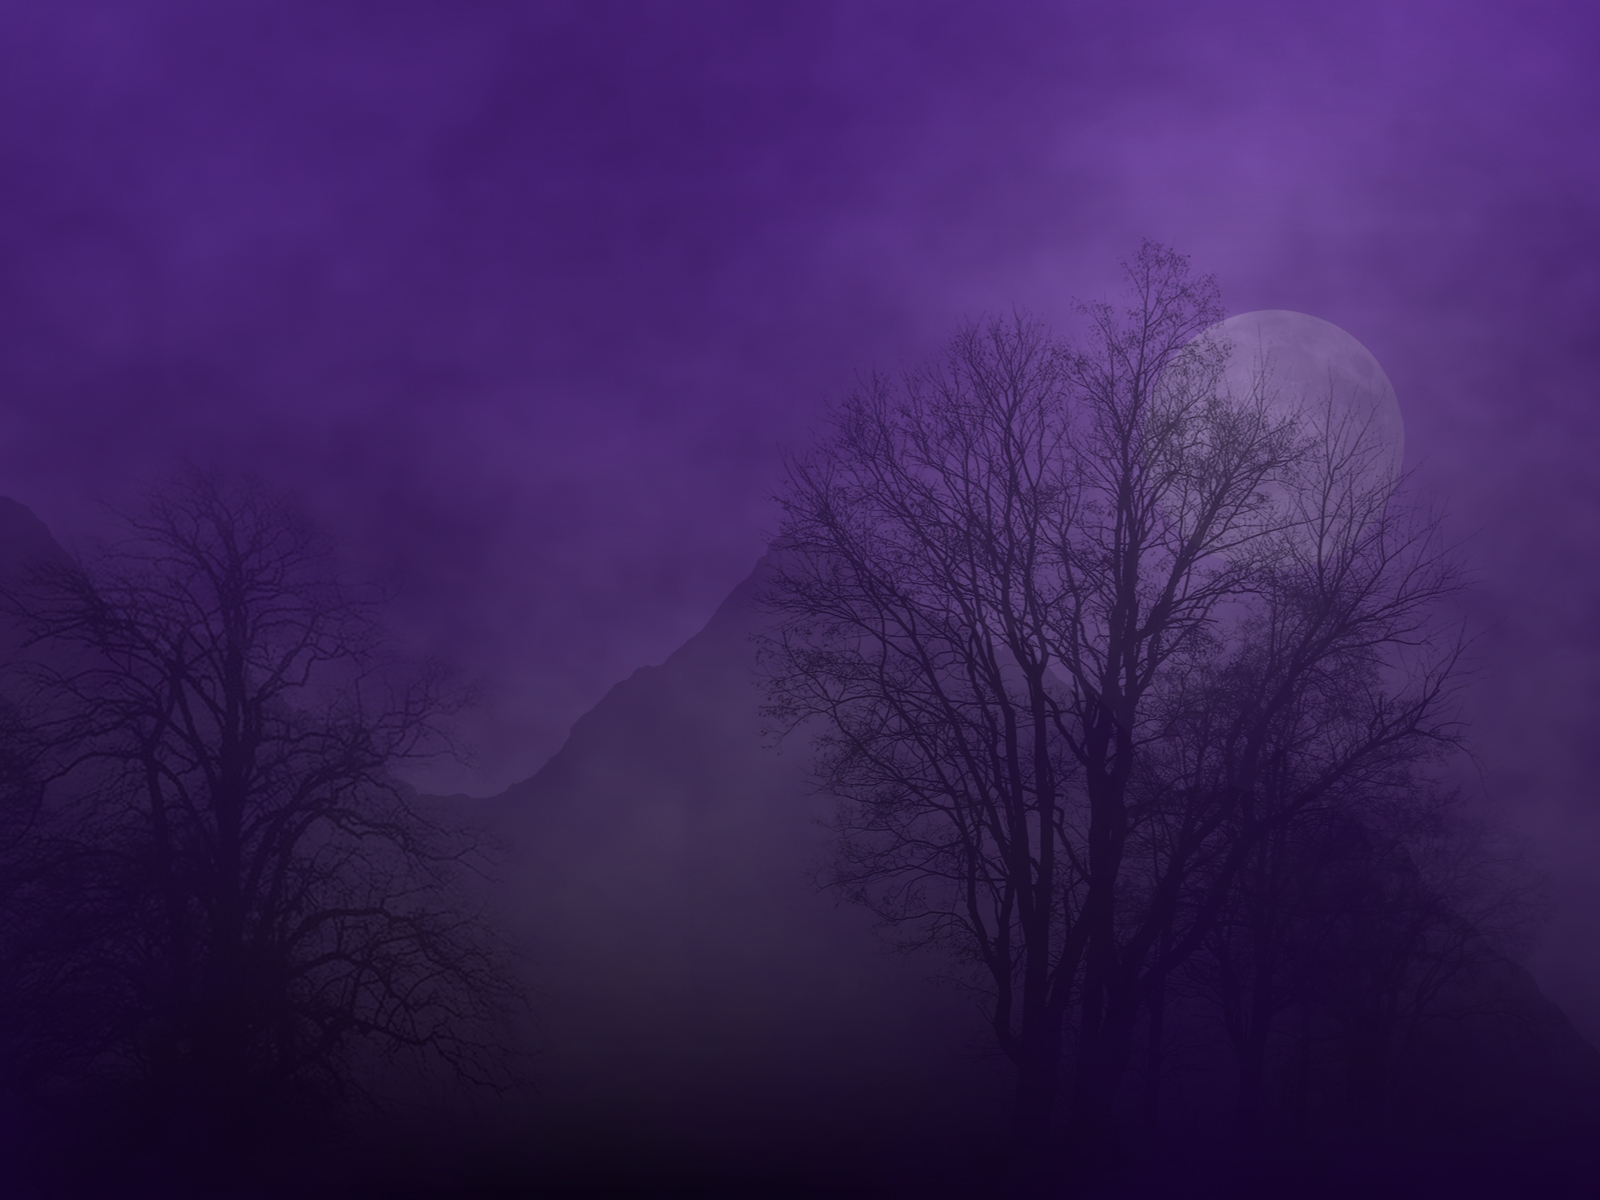 Purple haze background wallpapersafari - Purple moon wallpaper ...